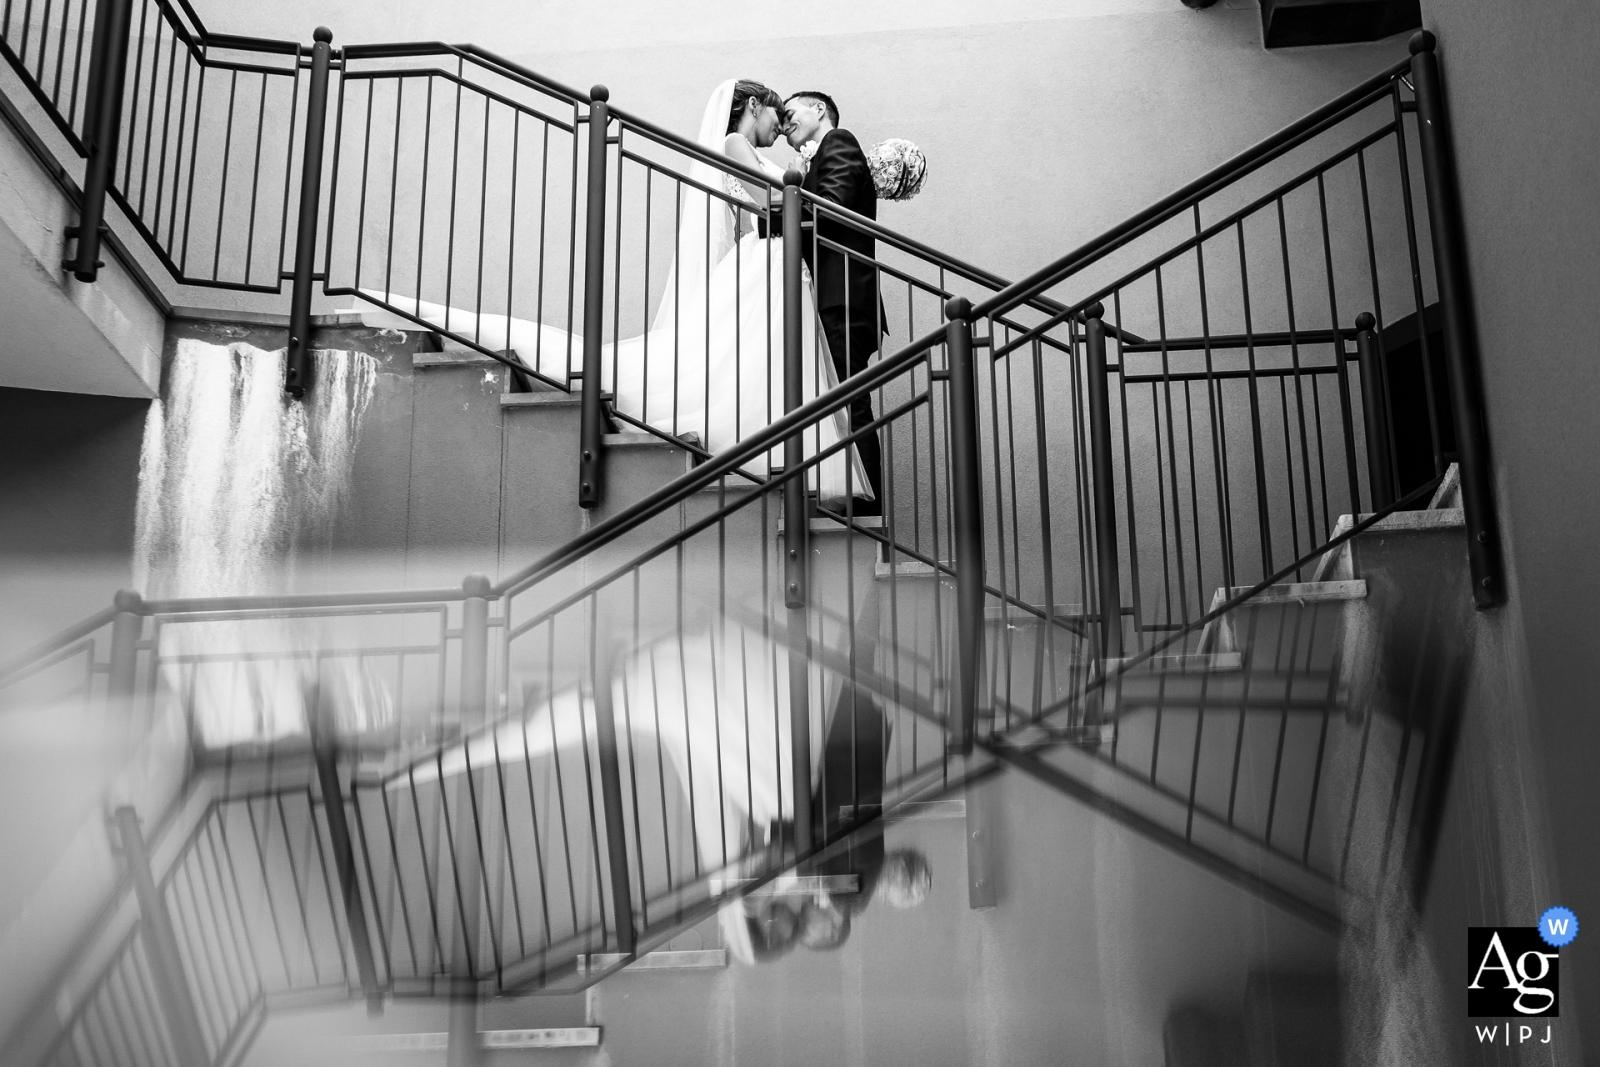 Portopiccolo Sistiana, Trieste, Italy Wedding Photography   Bride and groom reflections